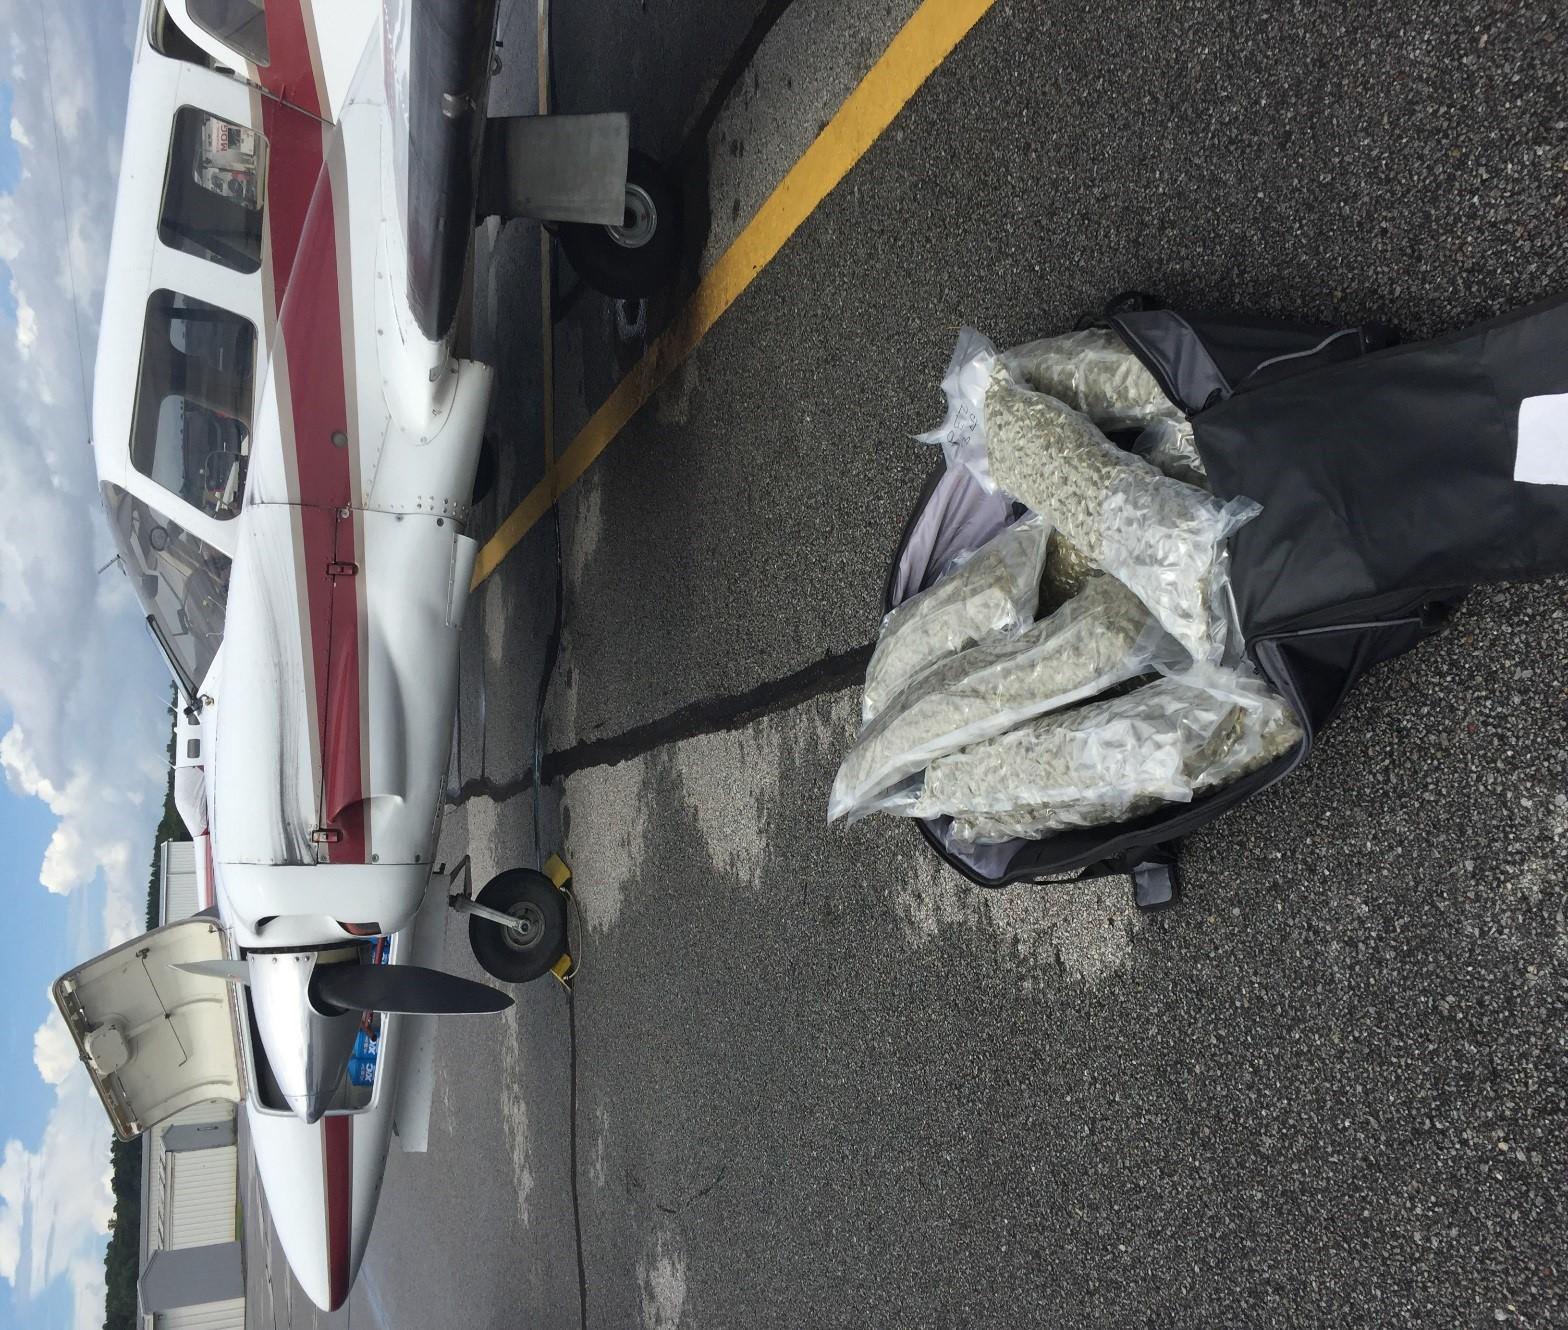 West Georgia Regional Airport Arrests and Seizure | Georgia Bureau